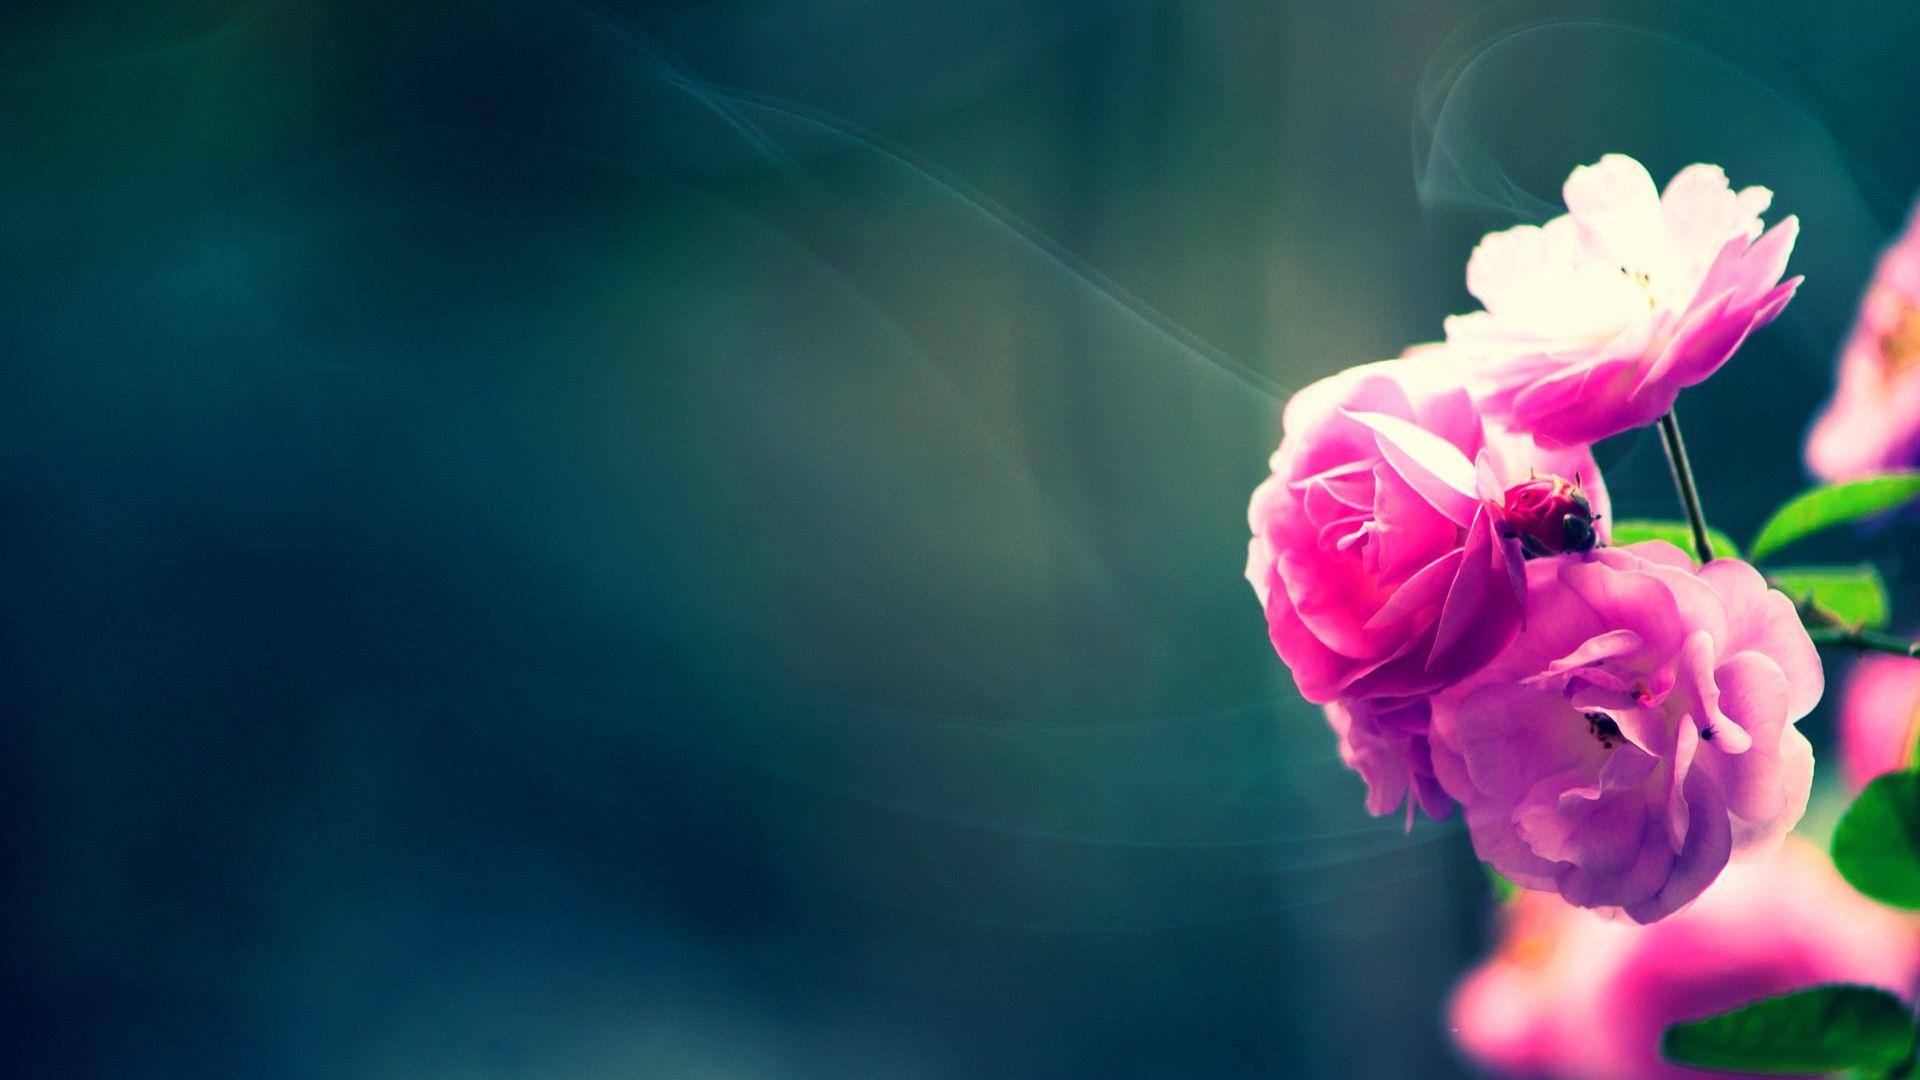 Pink Fresh Flower Hd 1080p Wallpapers Download Flower Background Wallpaper Flower Backgrounds Flower Wallpaper